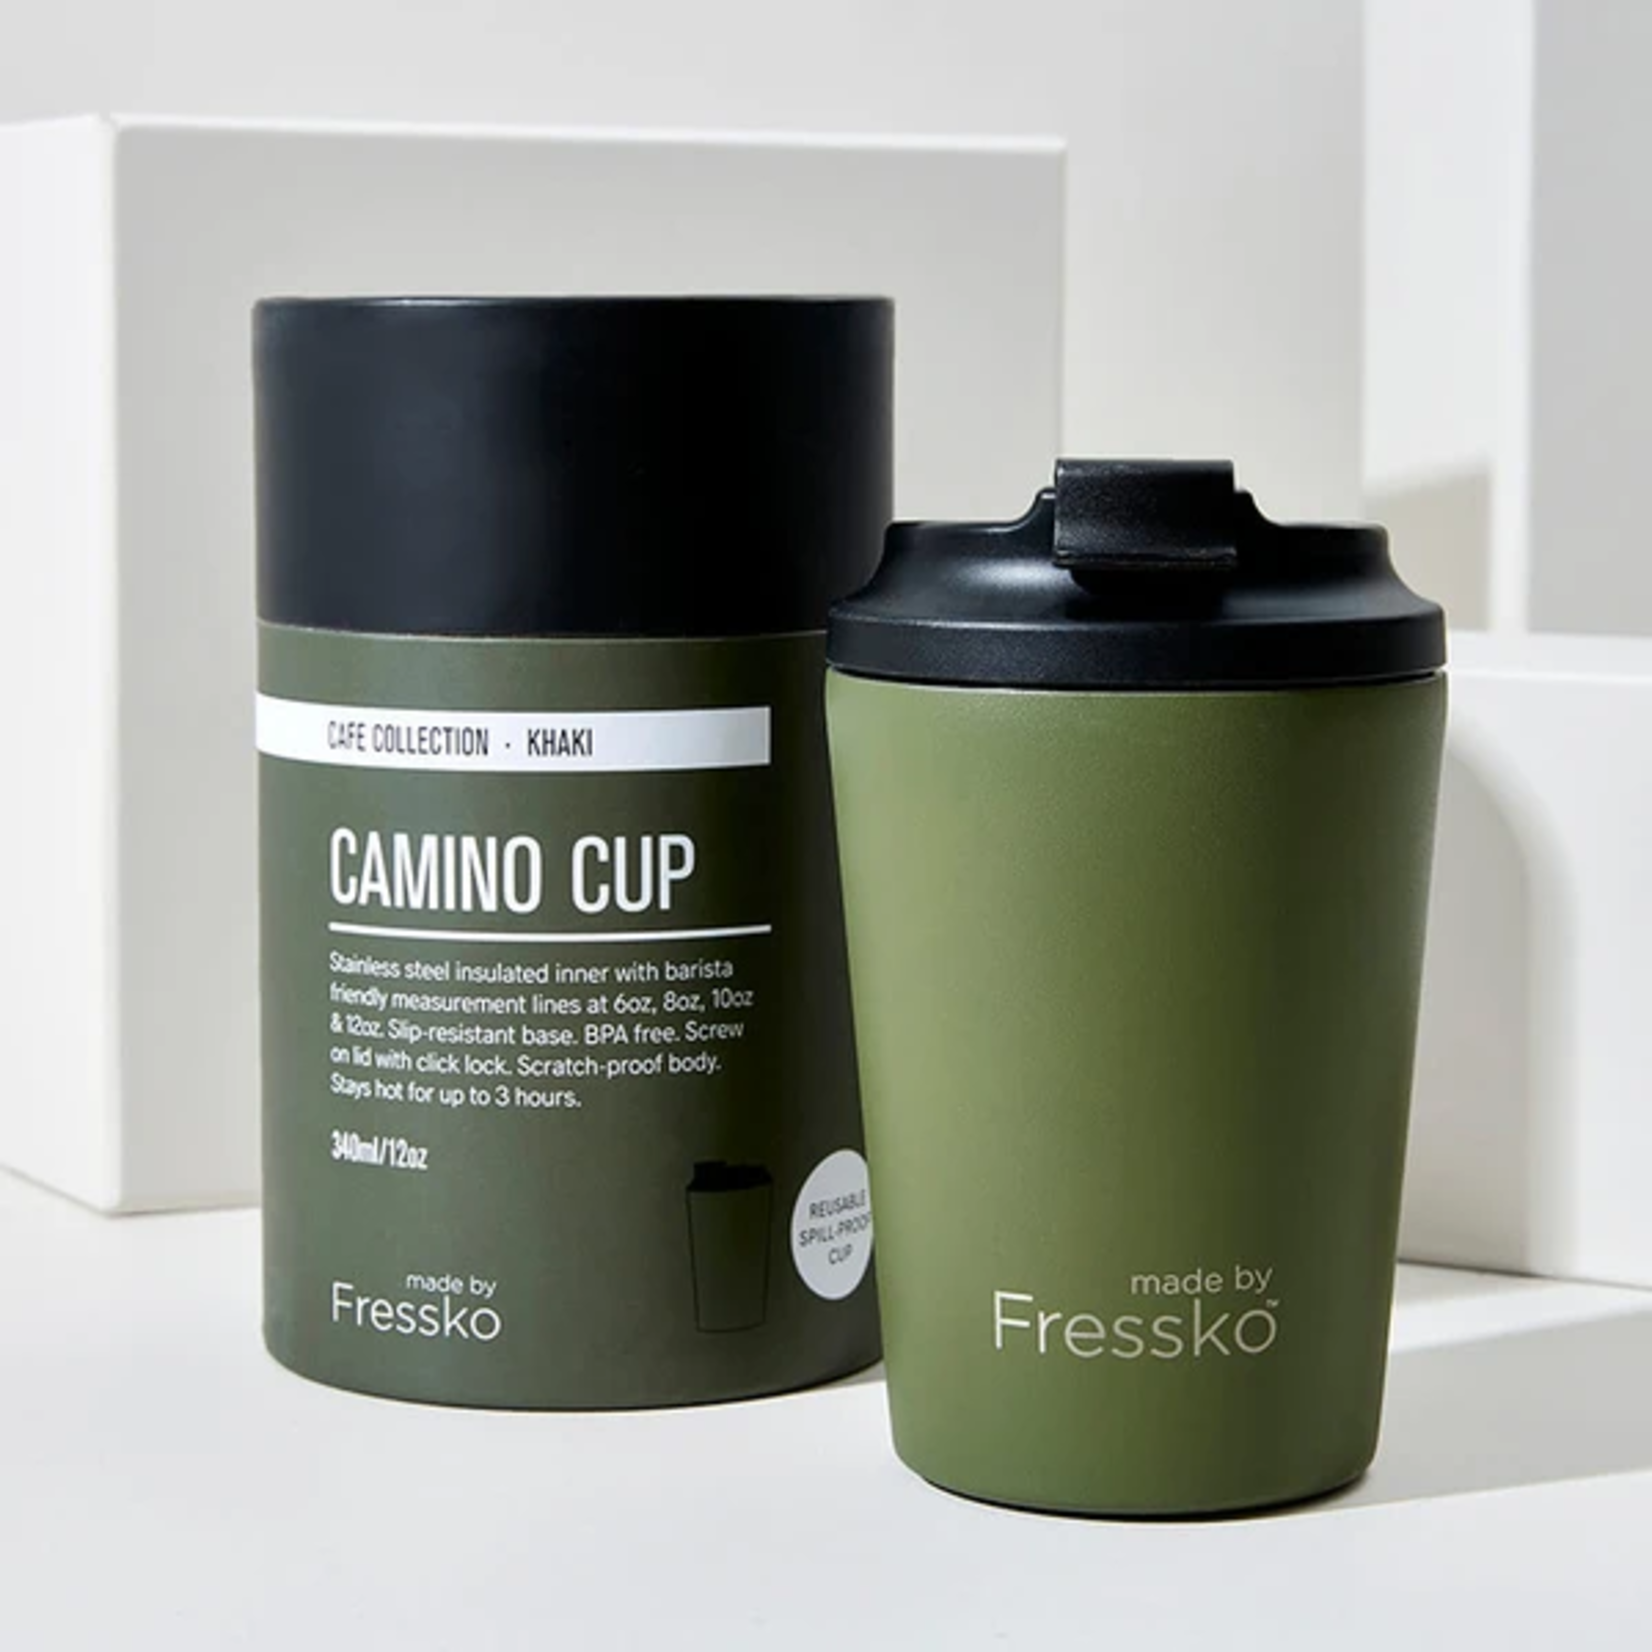 Made By Fressko Made By Fressko Camino Cup 12OZ